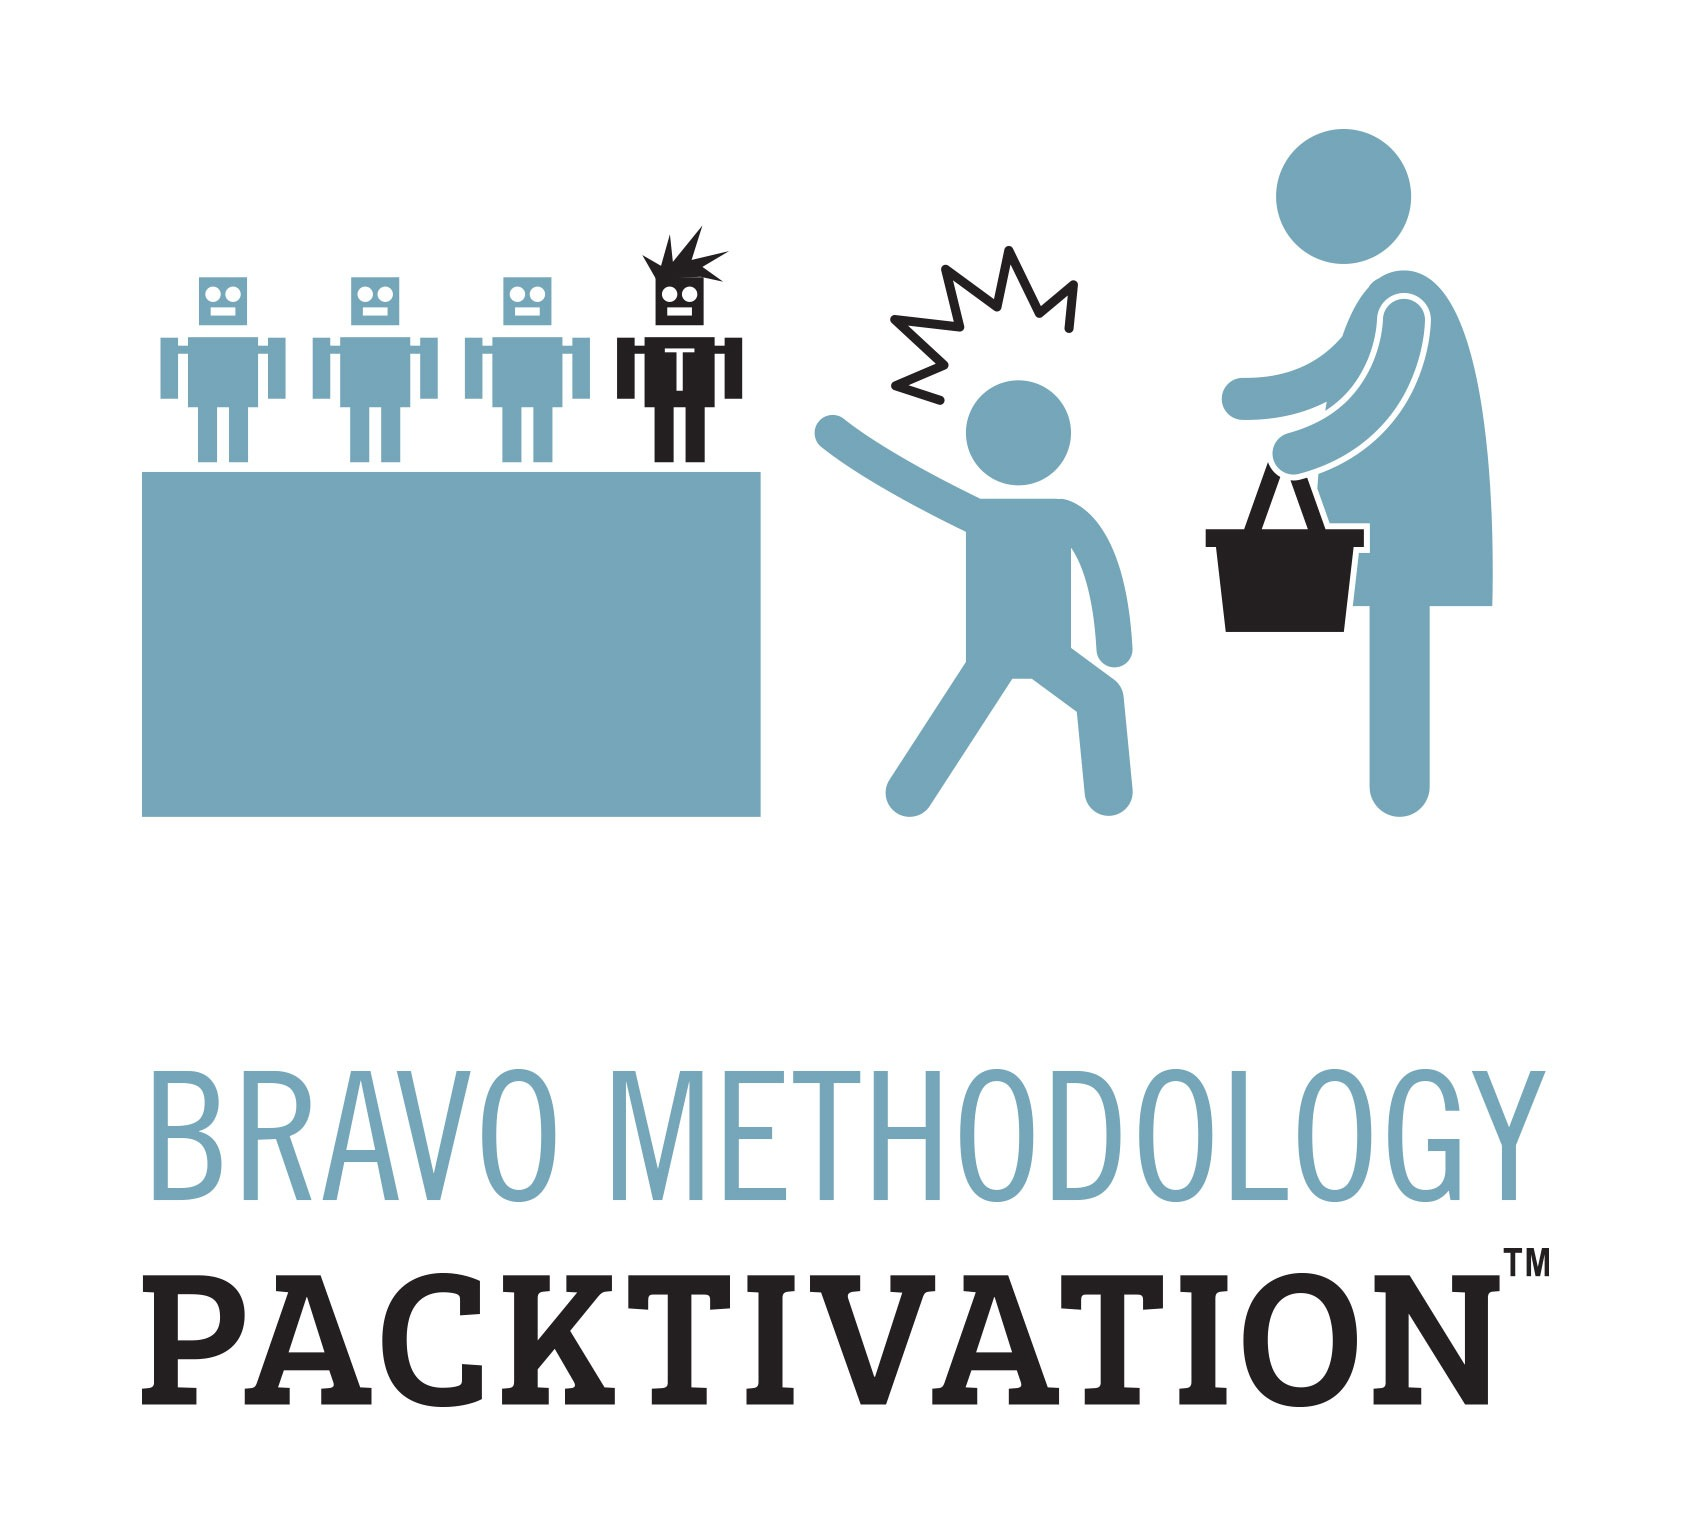 Bravo Methodology Pactivation